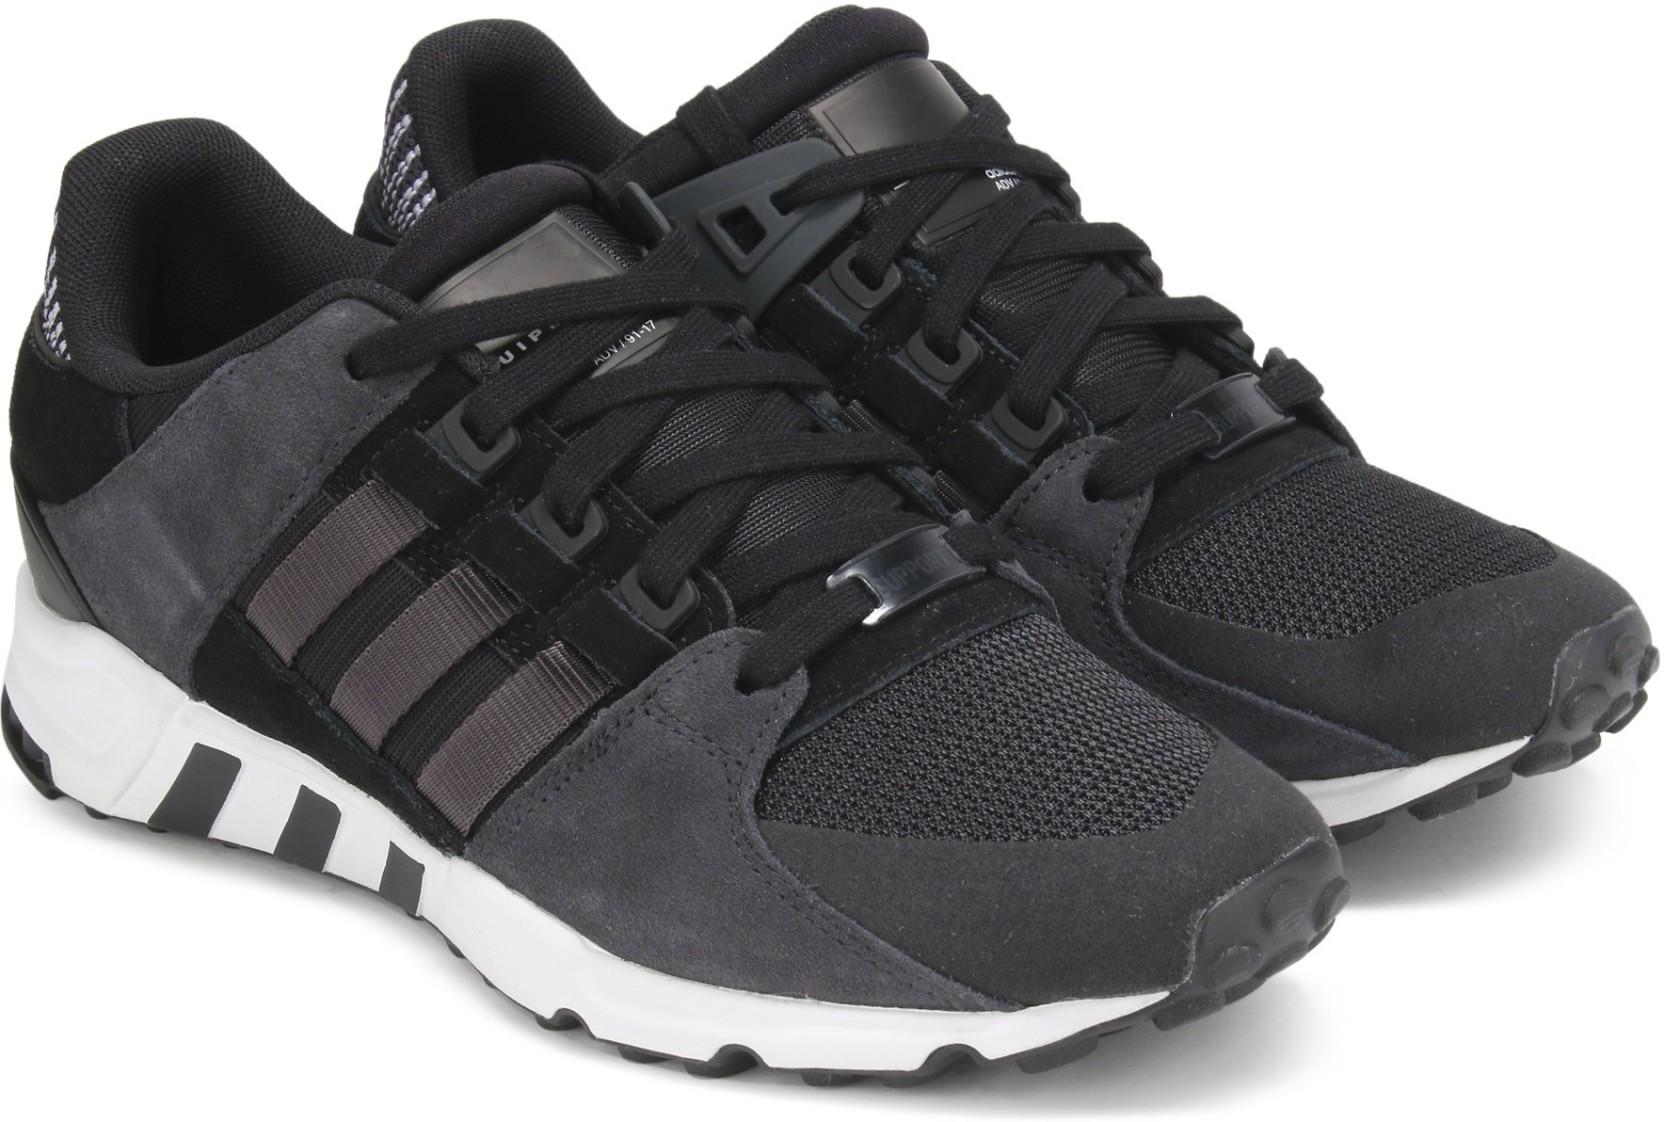 huge selection of bff77 b7f6d ADIDAS ORIGINALS EQT SUPPORT RF Sneakers For Men (Black)